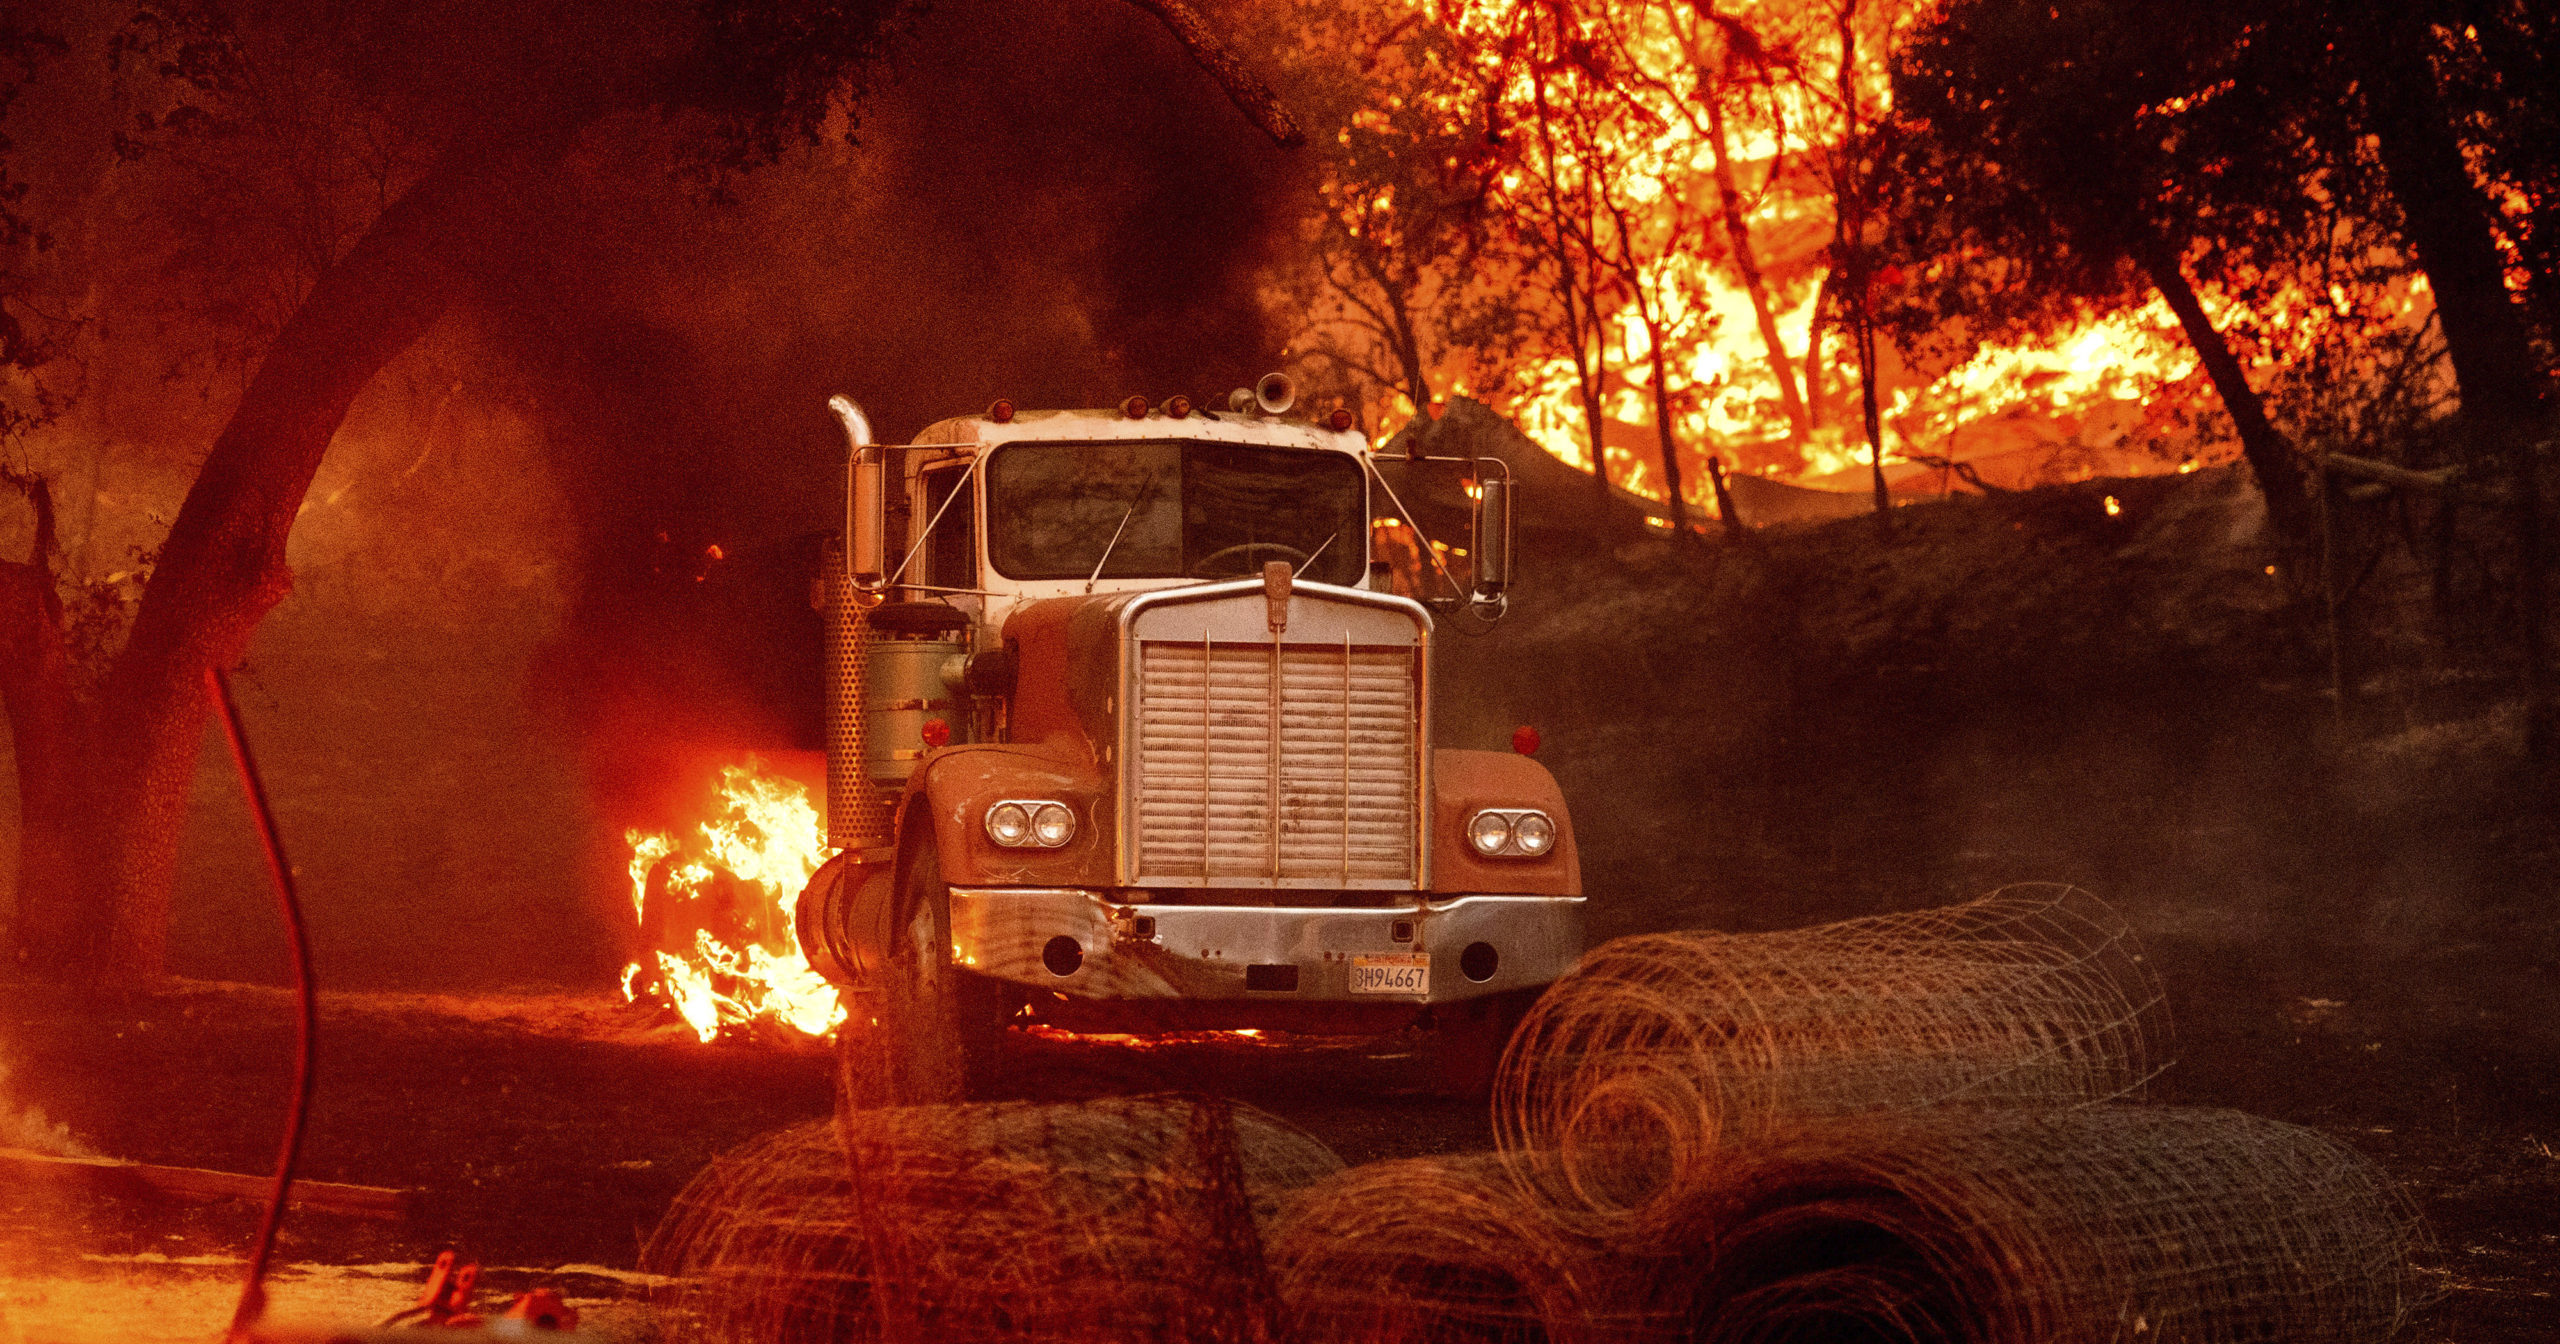 A truck burns in a Calistoga, California, vineyard on Oct. 1, 2020.